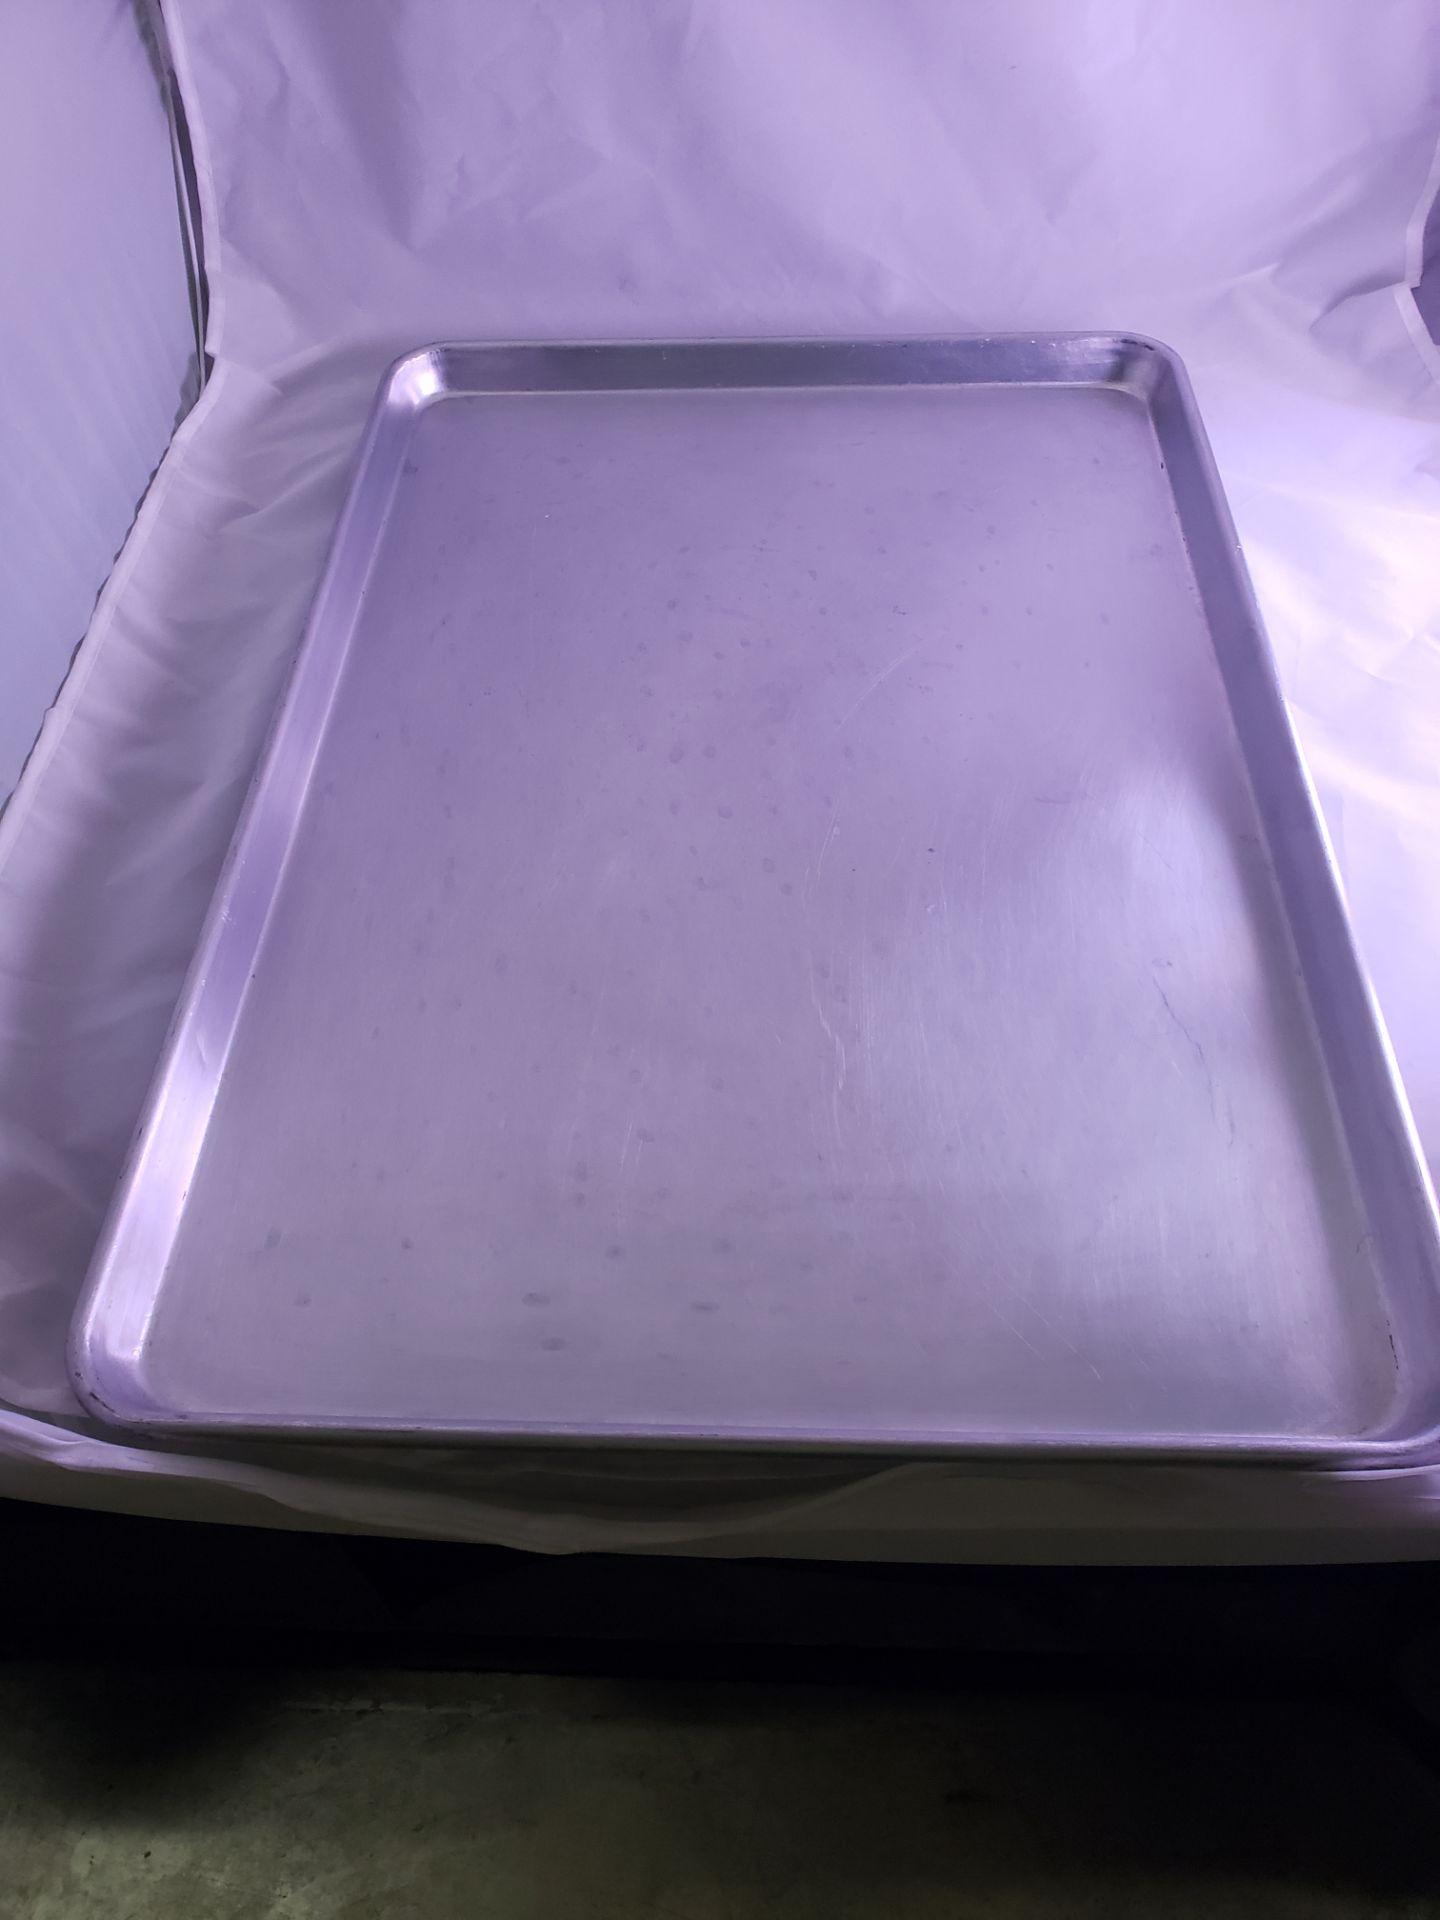 PANS- SHEET (FULL)